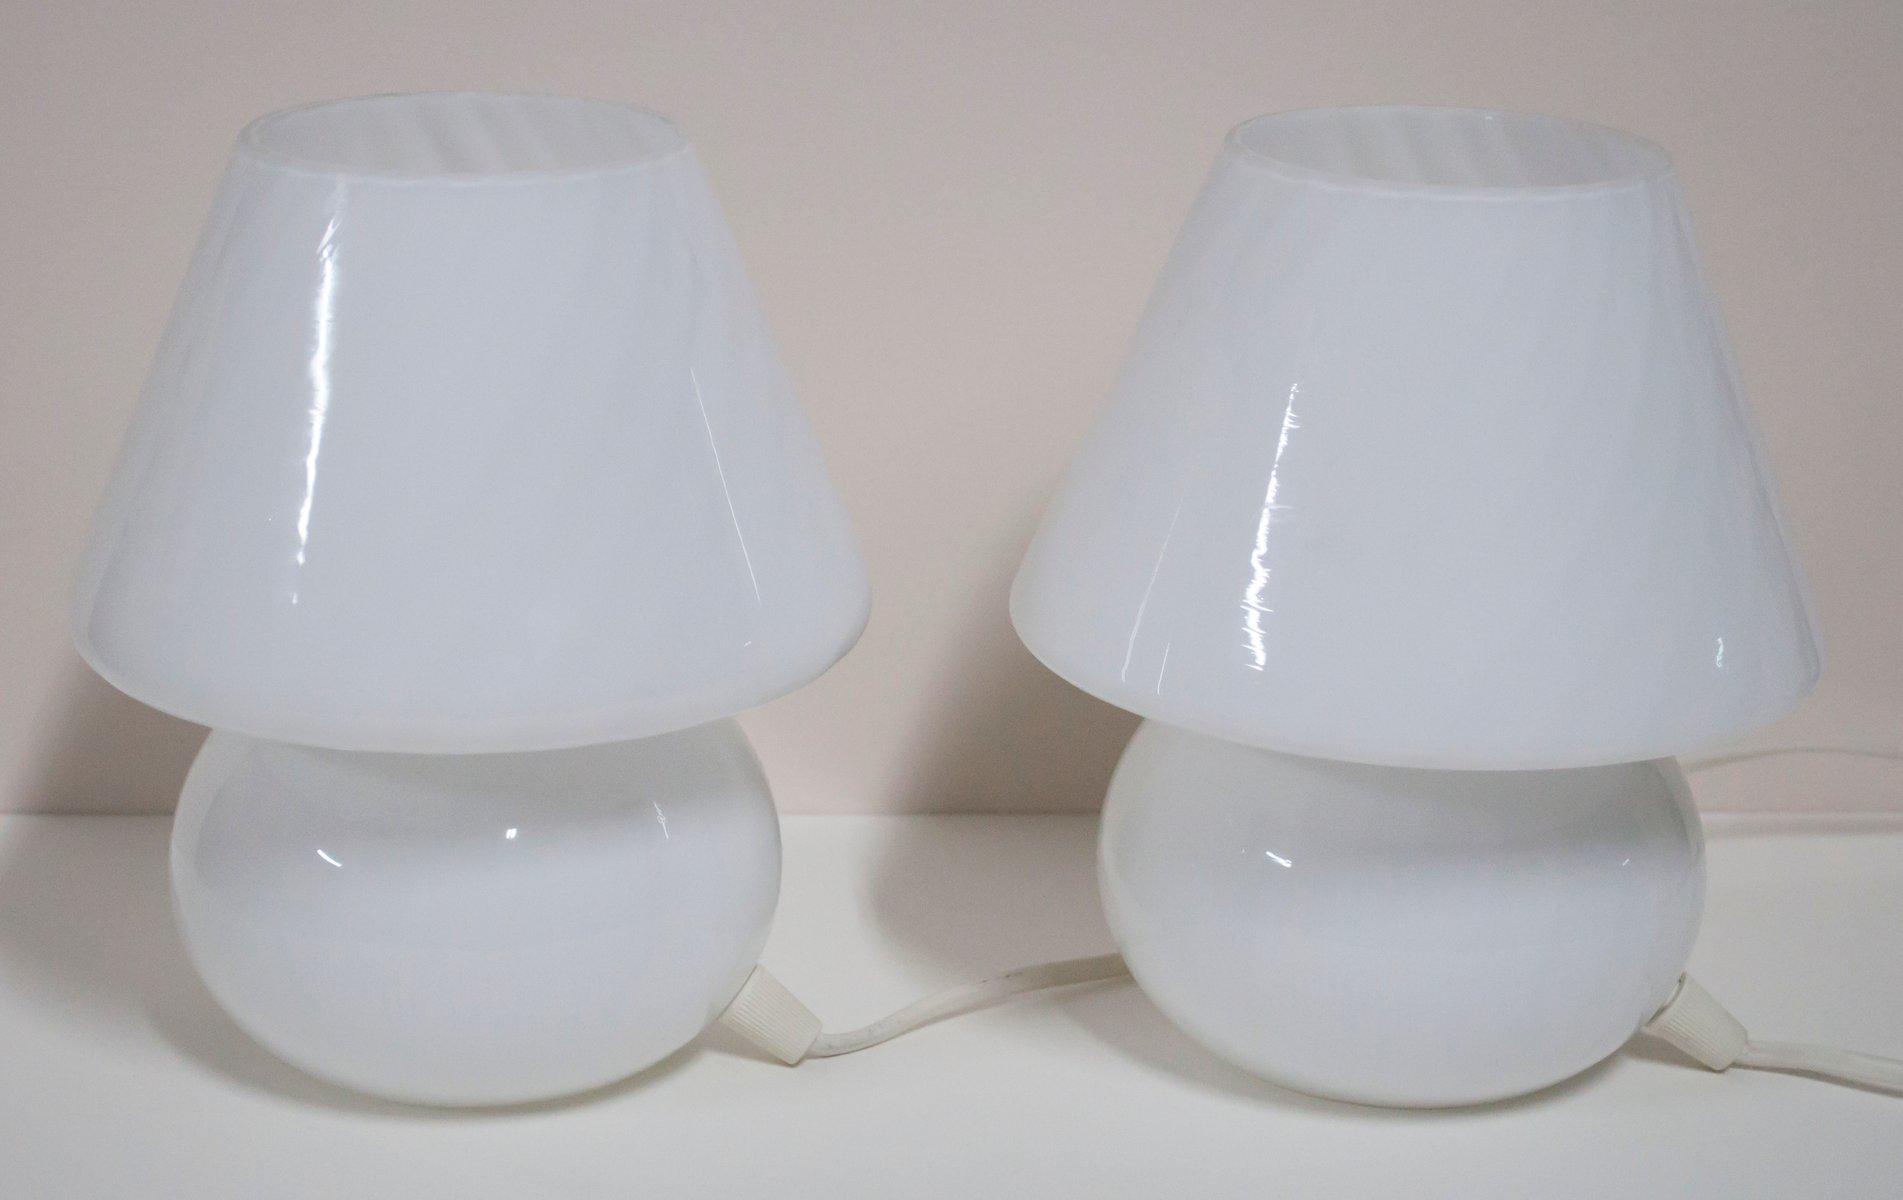 Mushroom Tischlampen von Paolo Venini, 1960er, 2er Set